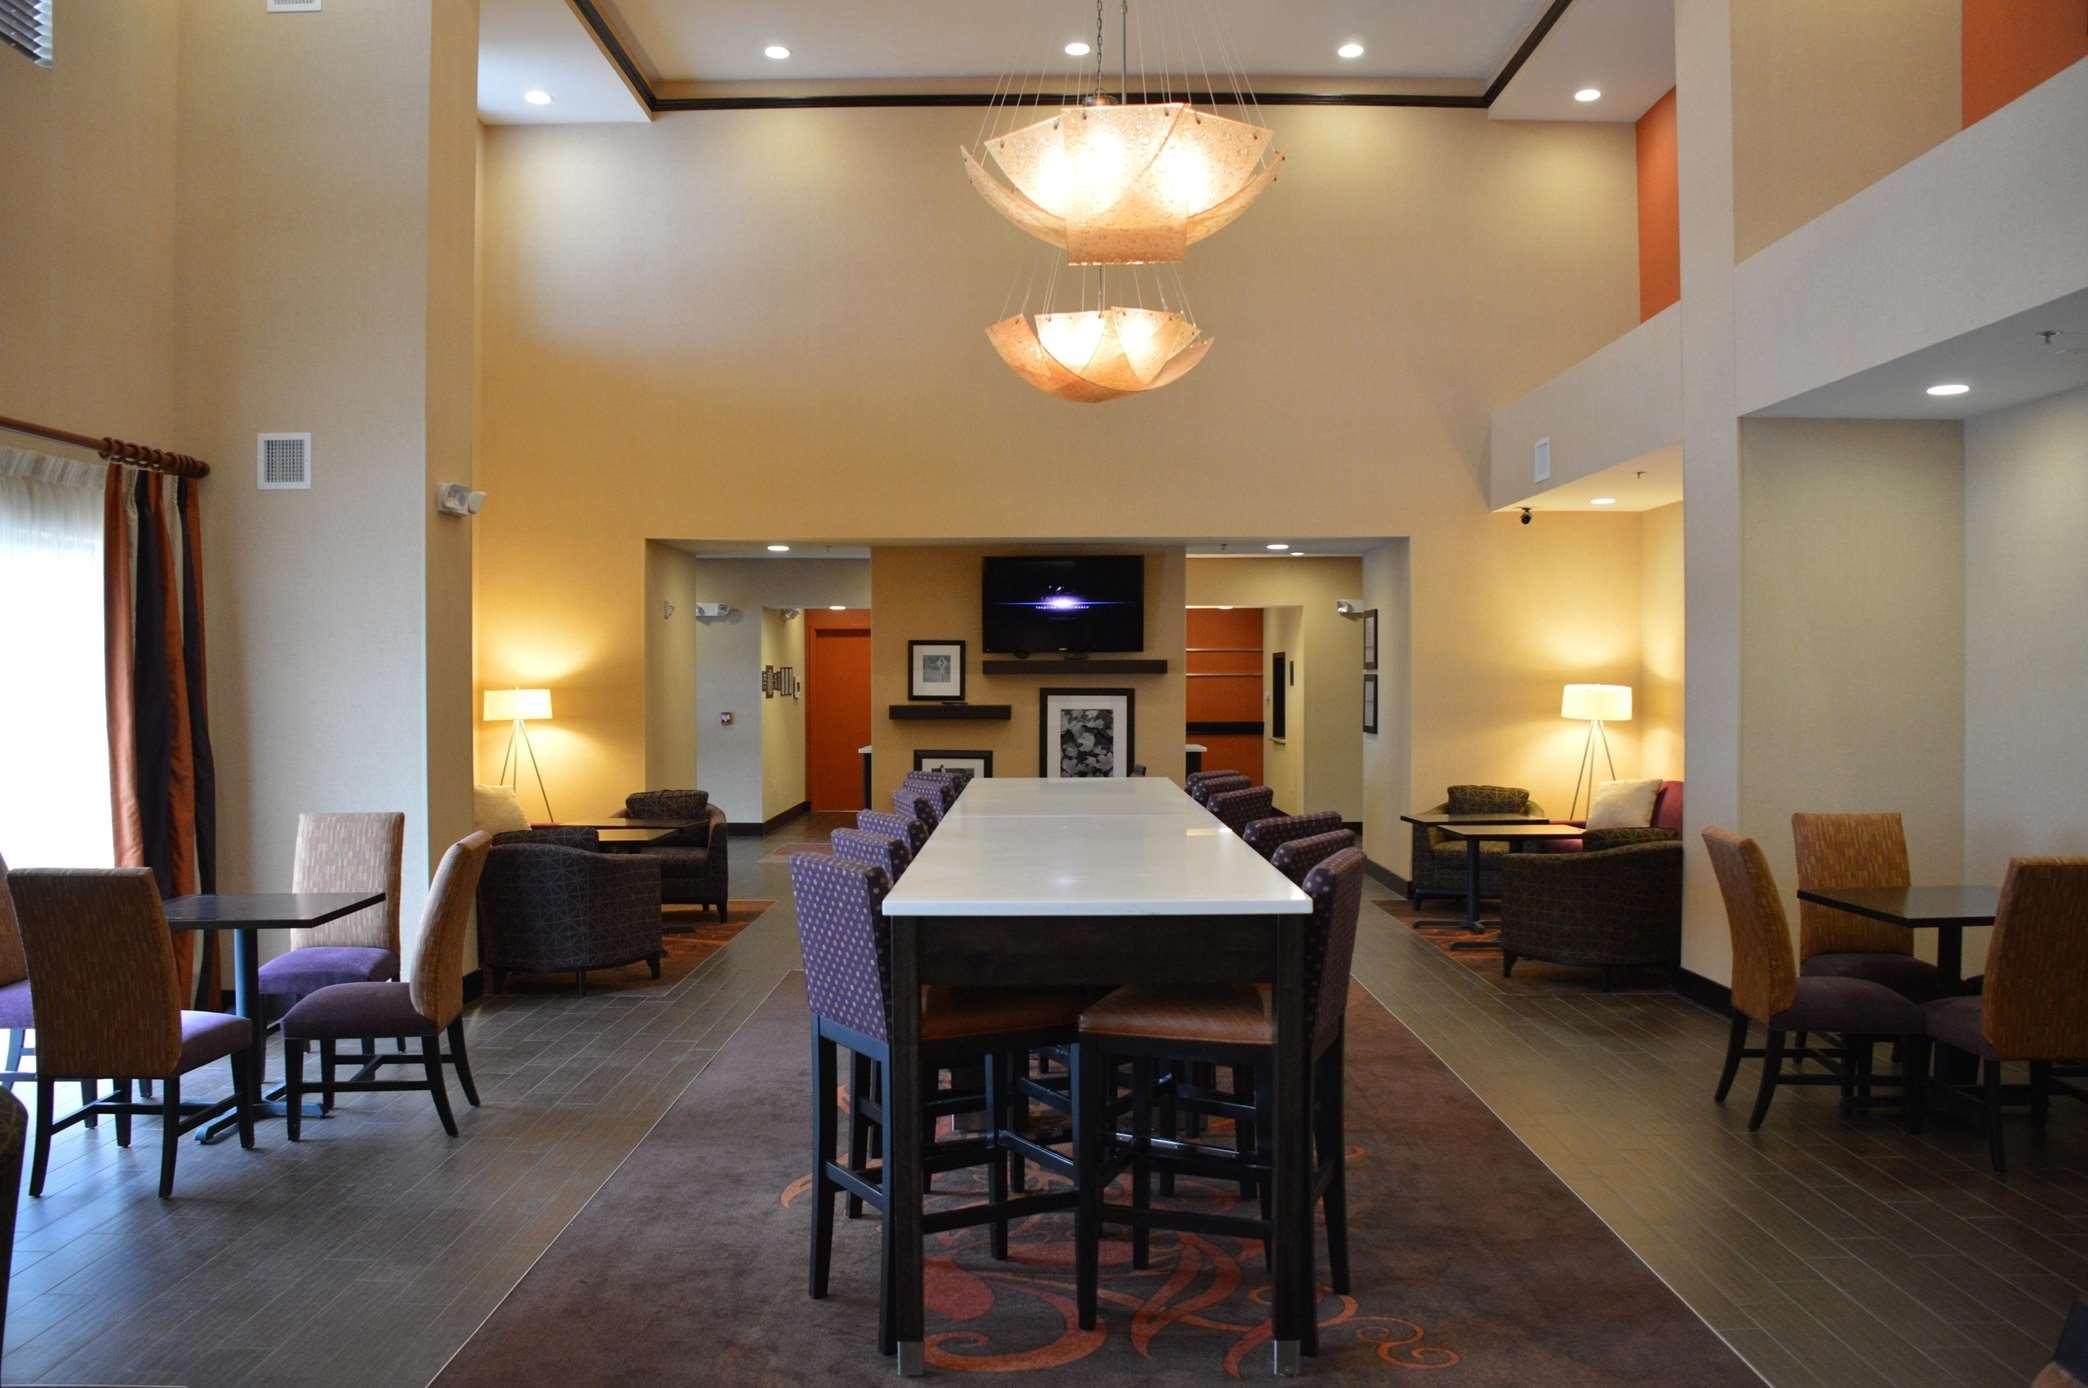 Hampton Inn & Suites Jamestown, ND image 13